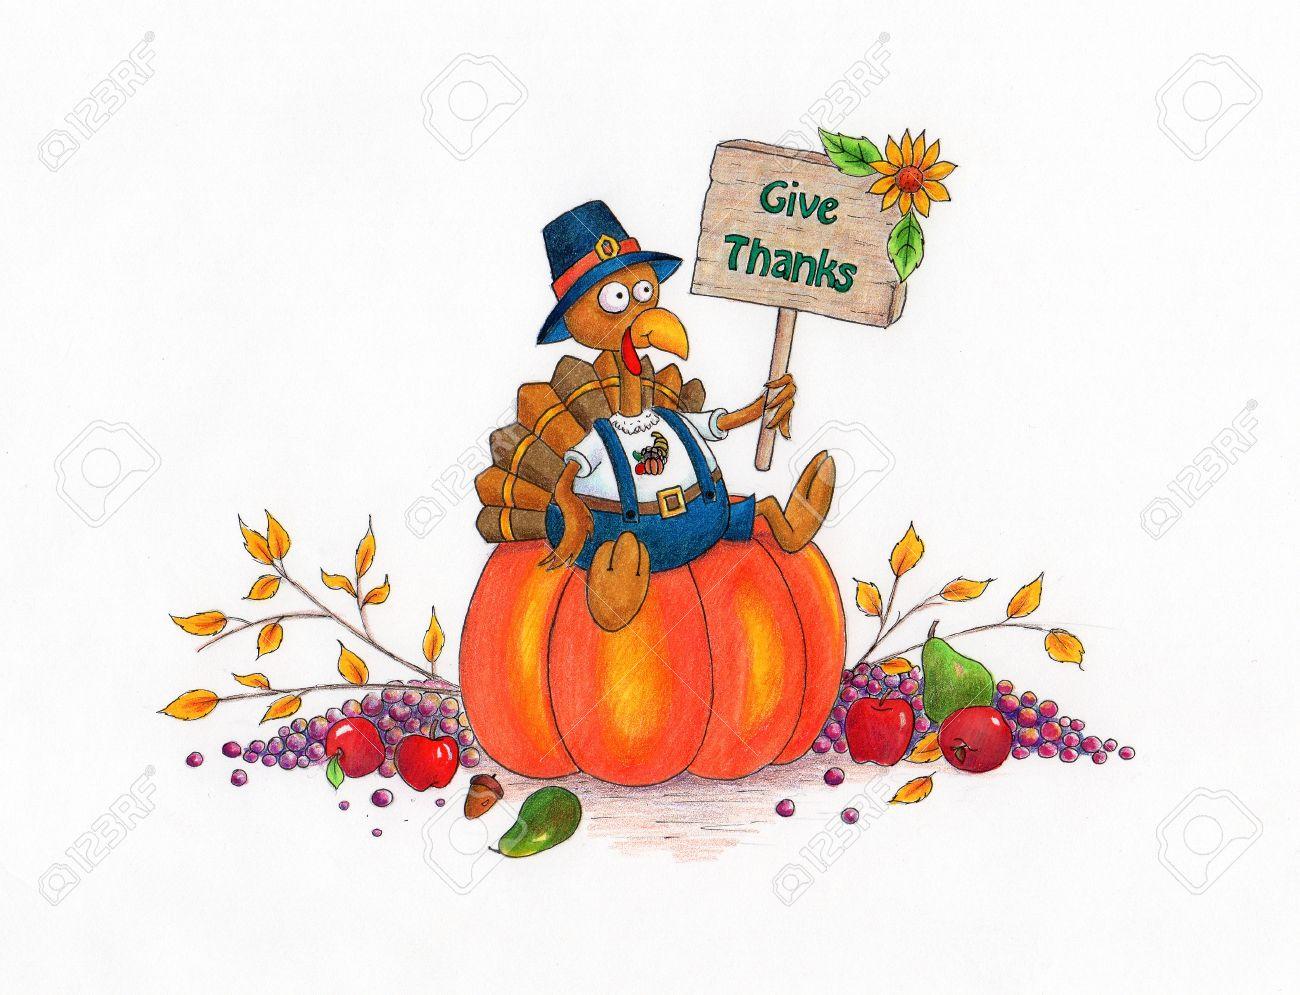 Dar Gracias Turquía Pavo De Thanksgiving Dibujos Animados Que Se